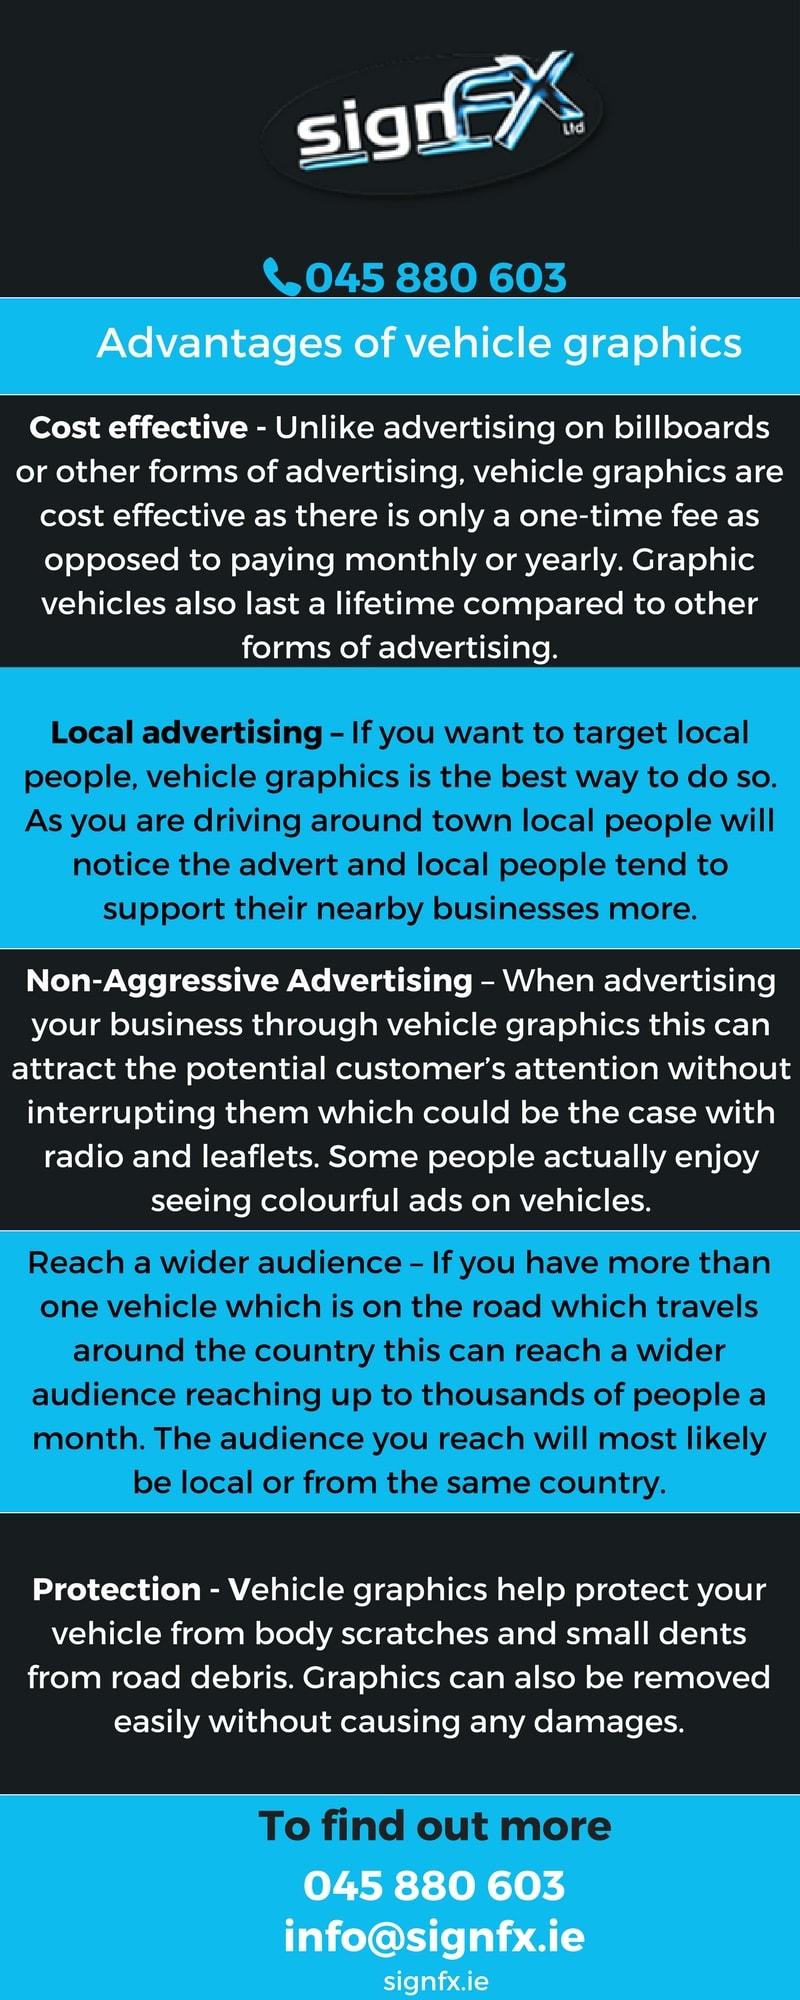 Advantages of vehicle graphics